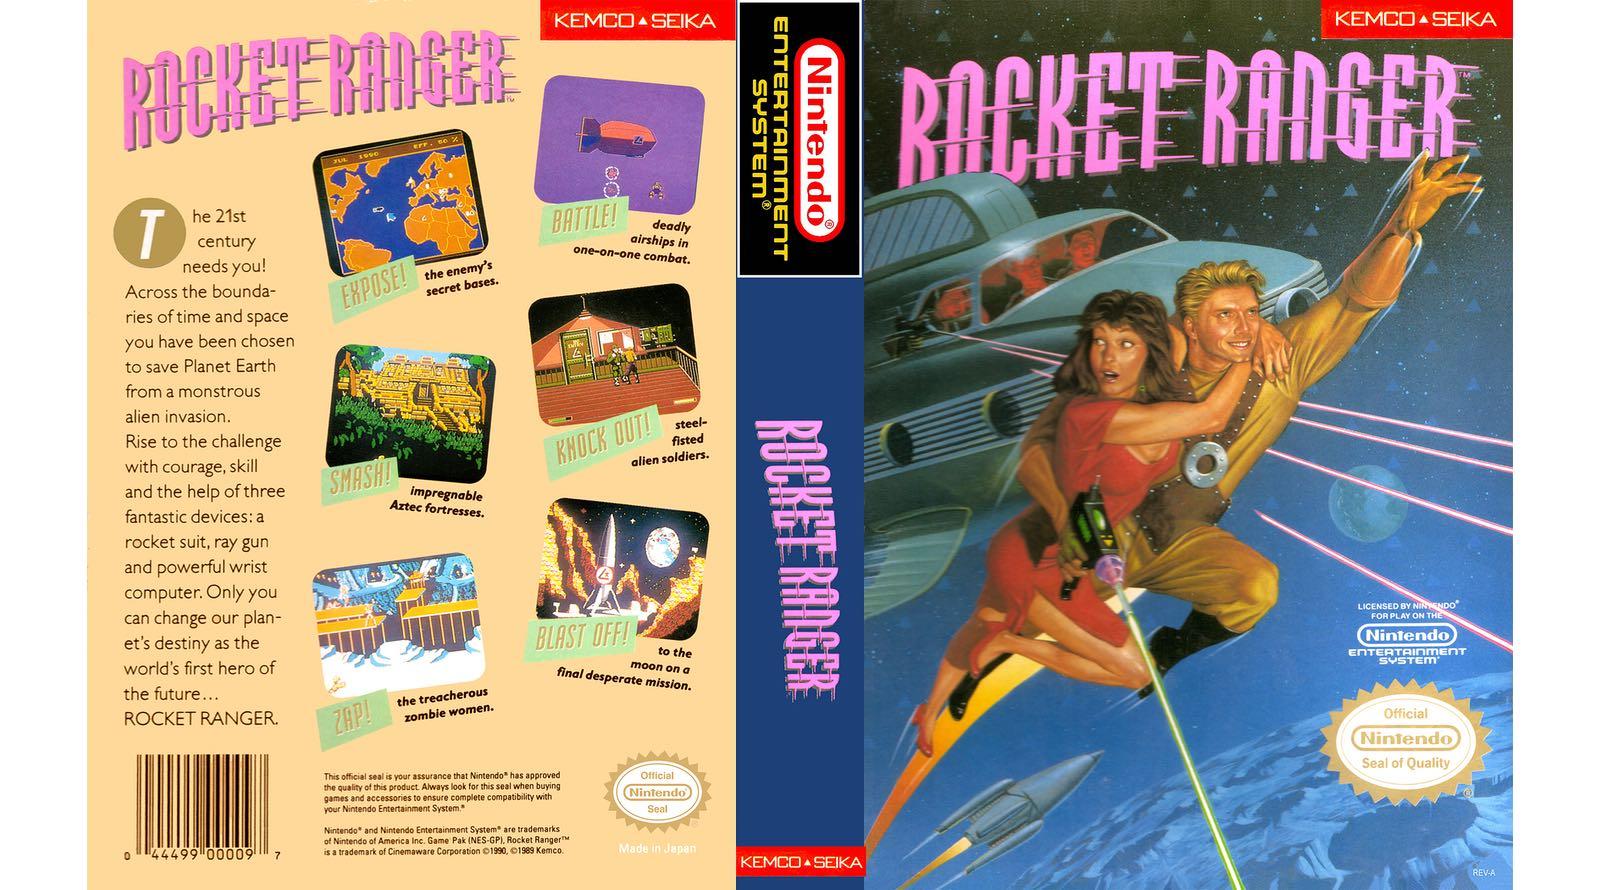 feat-rocket-ranger